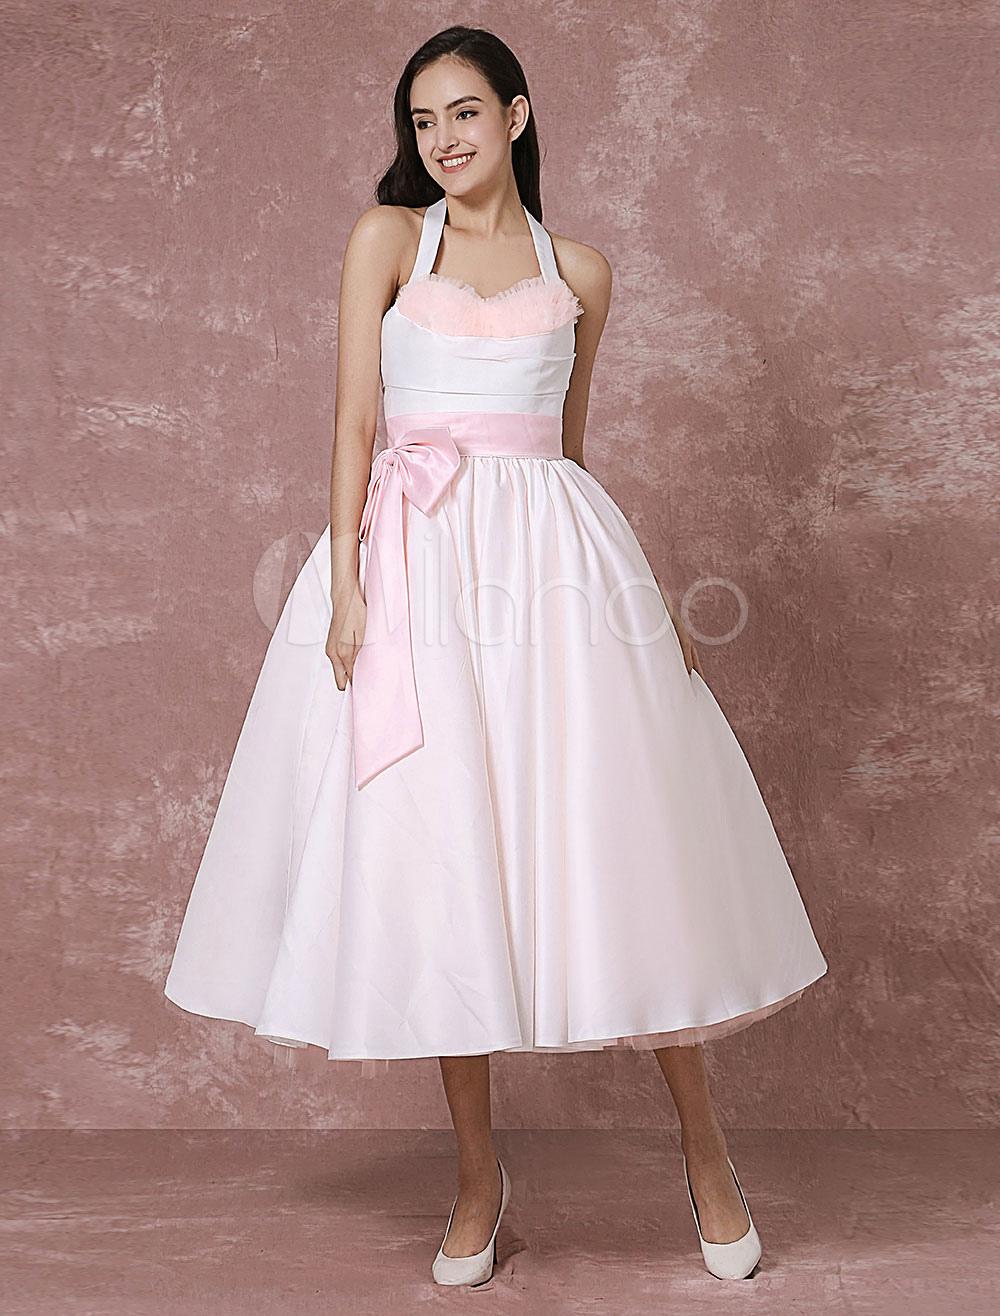 Vintage Wedding Dress Pink Tulle Short Bridal Gown Halter Satin Ribbon Sash Ball Gown Tea-length Bridal Dress Milanoo photo